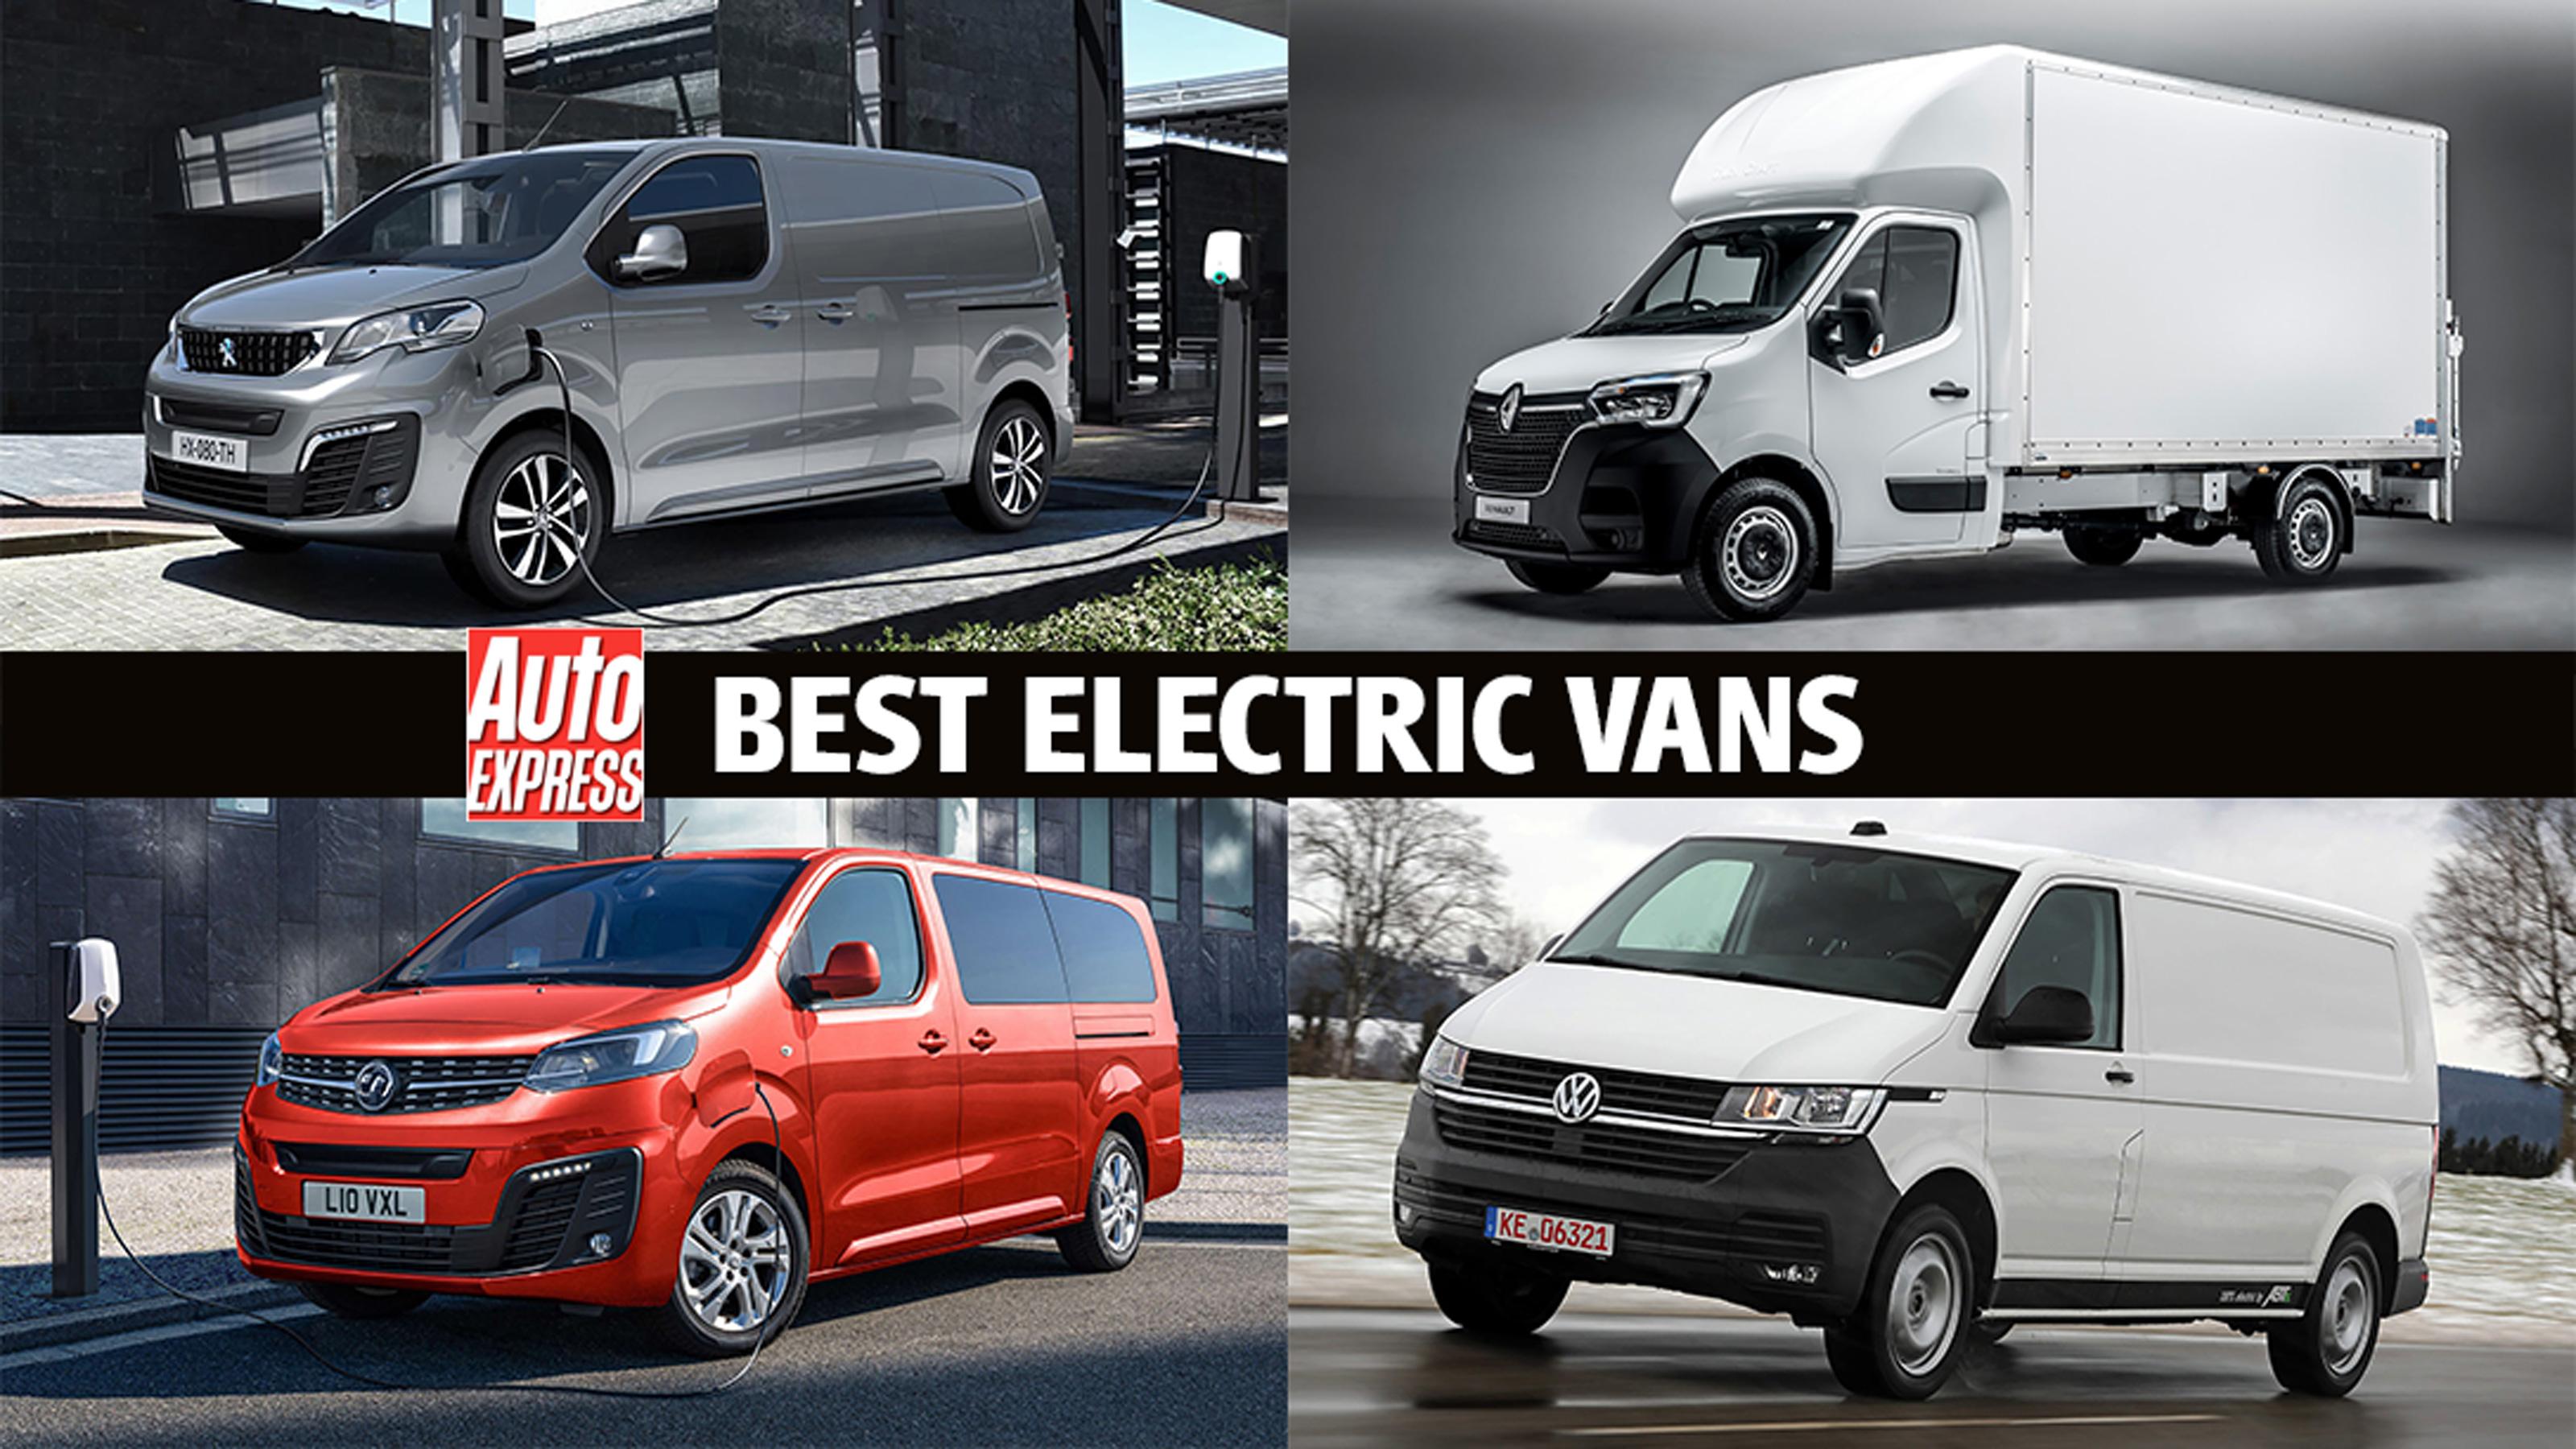 Best Electric Vans 2021 Auto Express